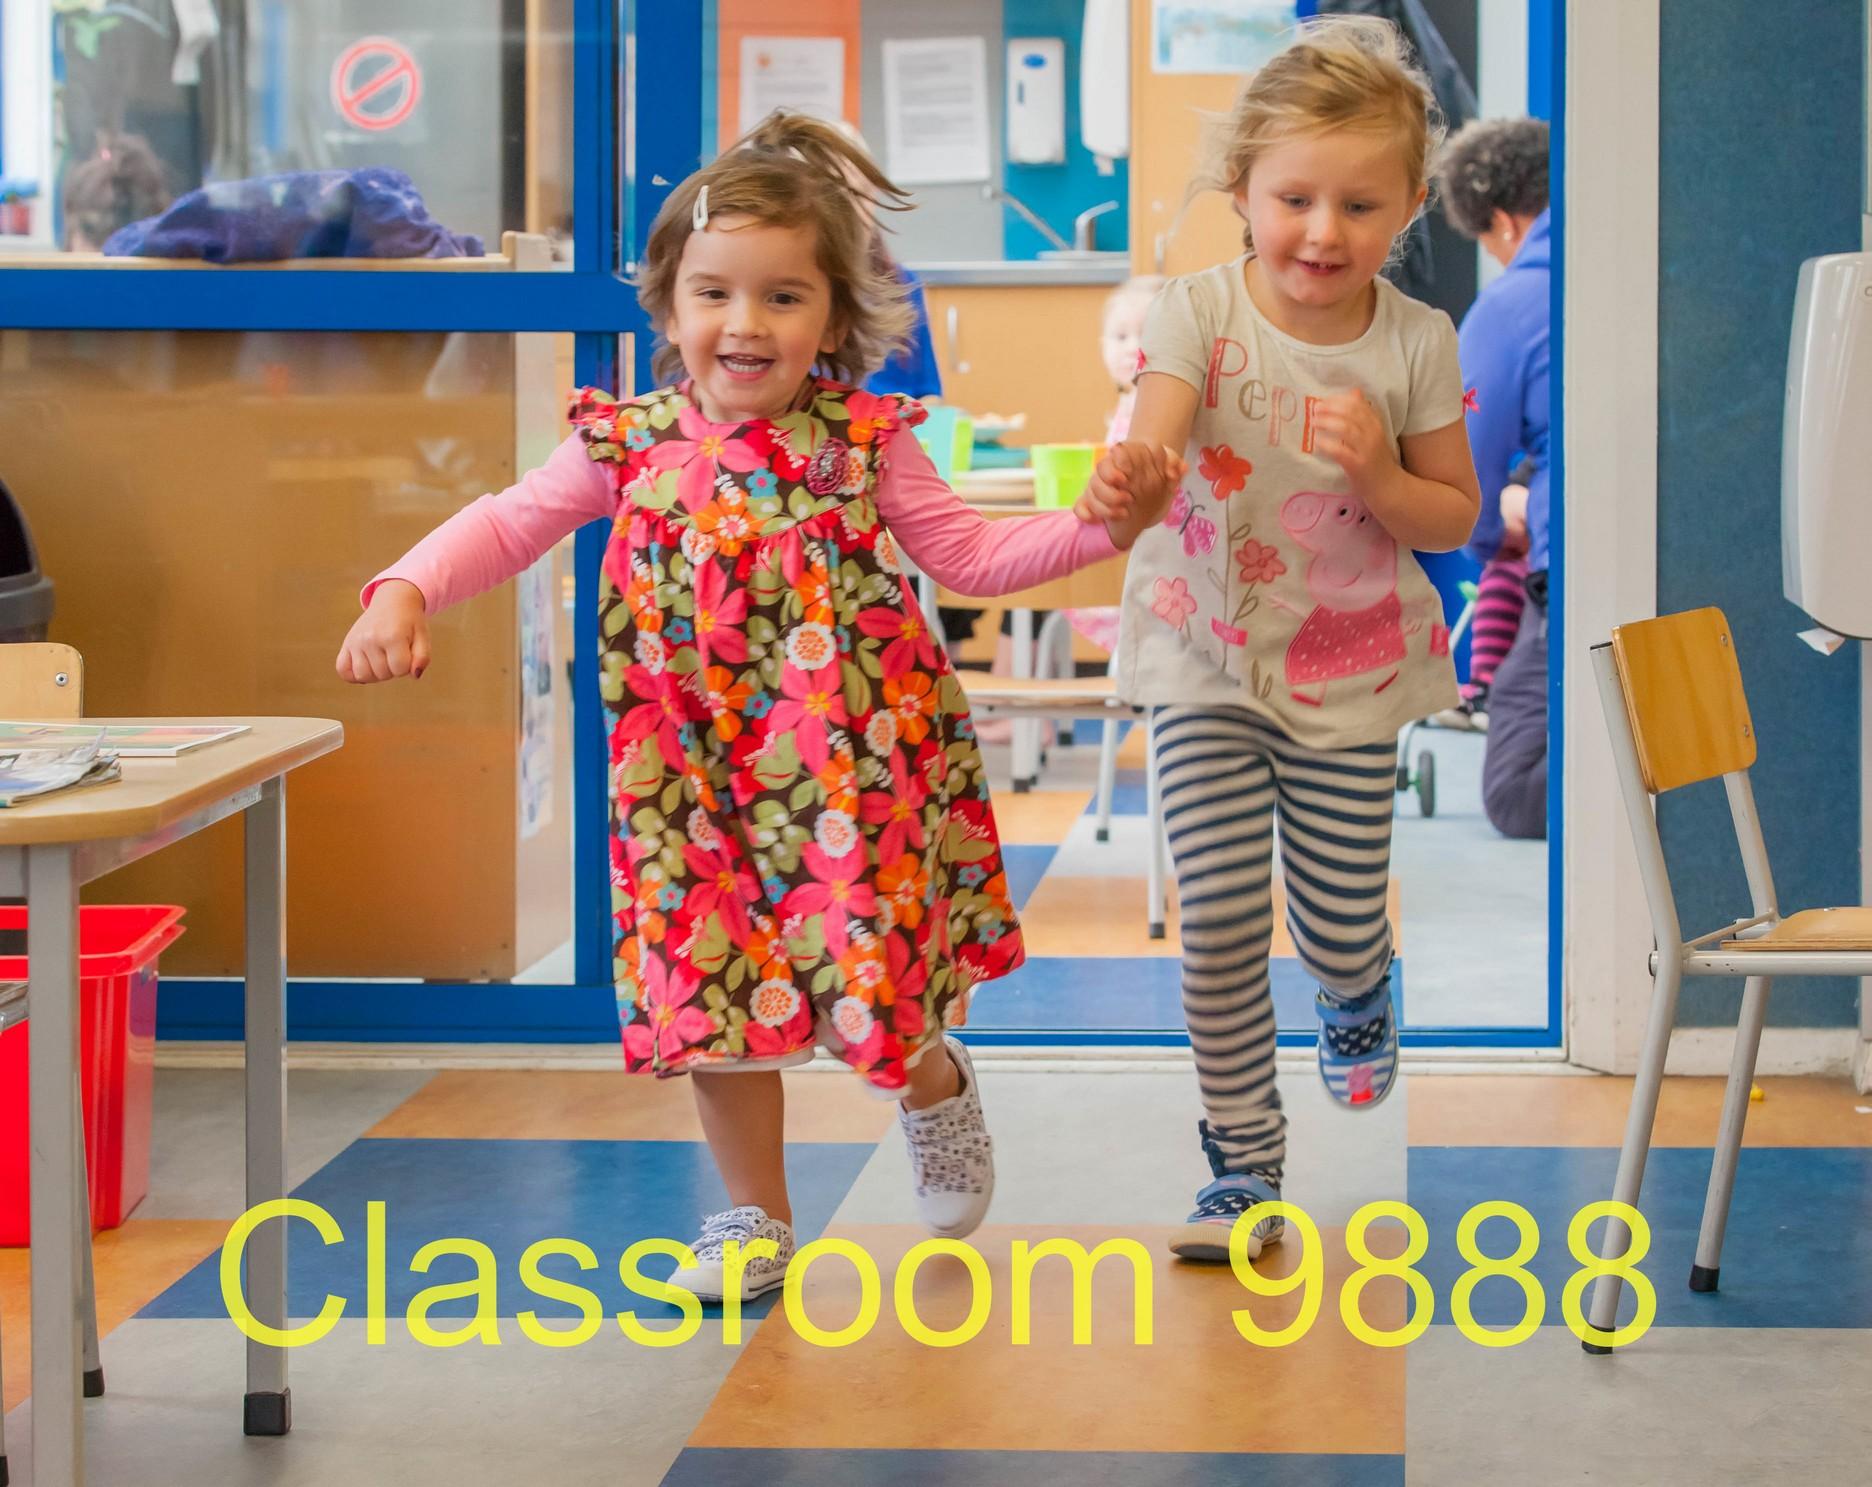 Classroom 9888